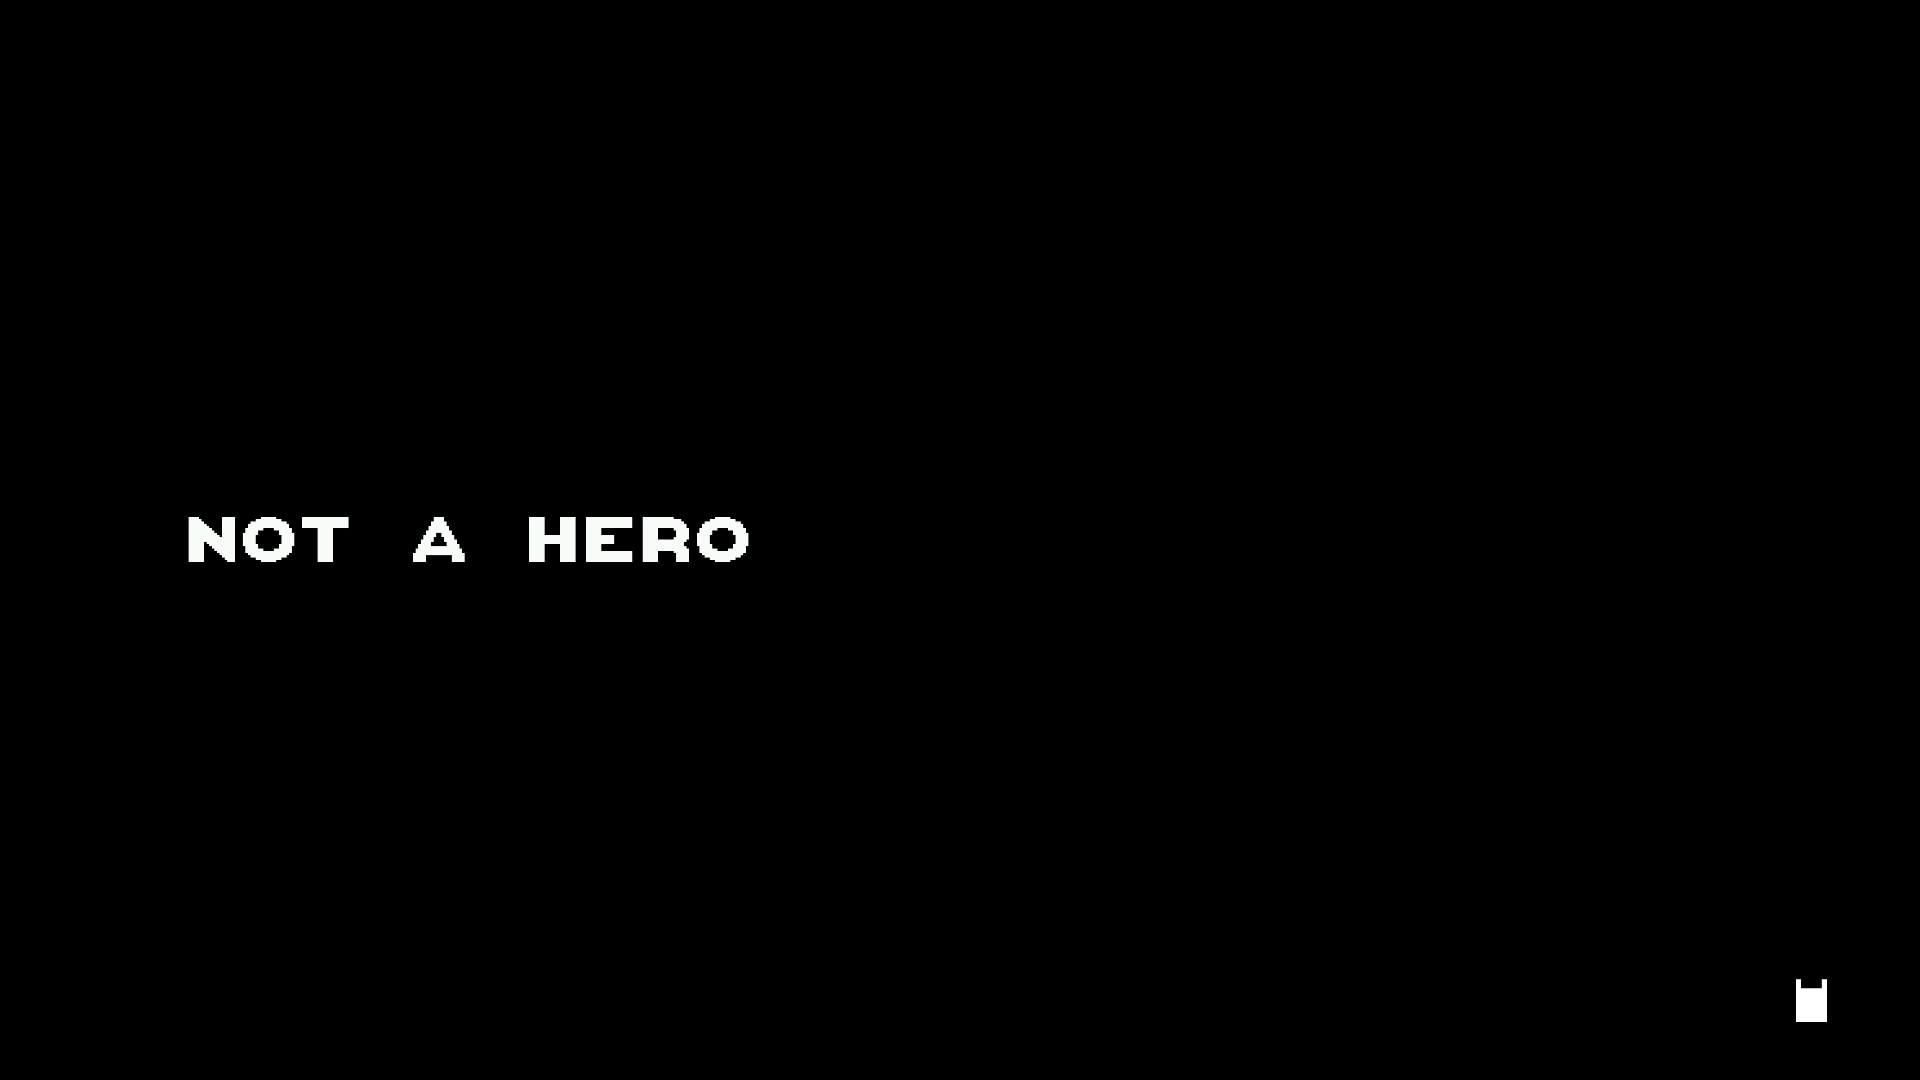 NOT A HERO_20170729141933